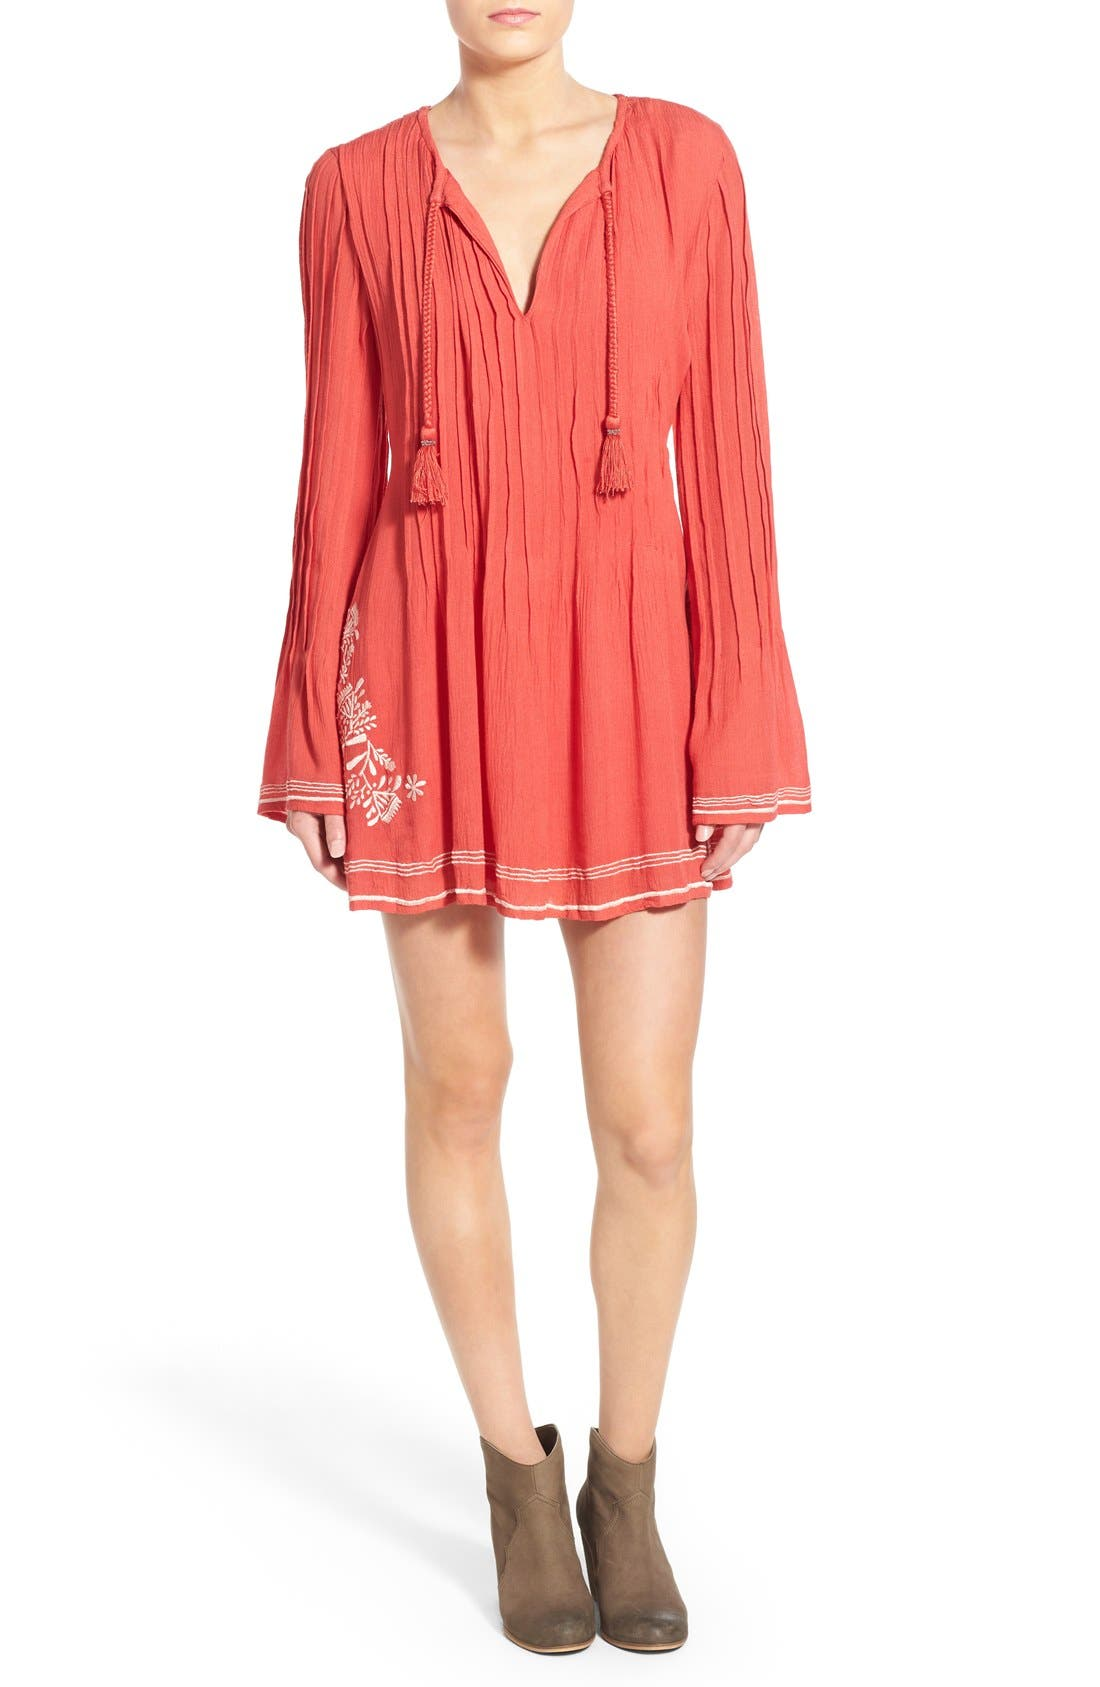 TULAROSA, 'Audrey' Embroidered Tunic Dress, Main thumbnail 1, color, 650